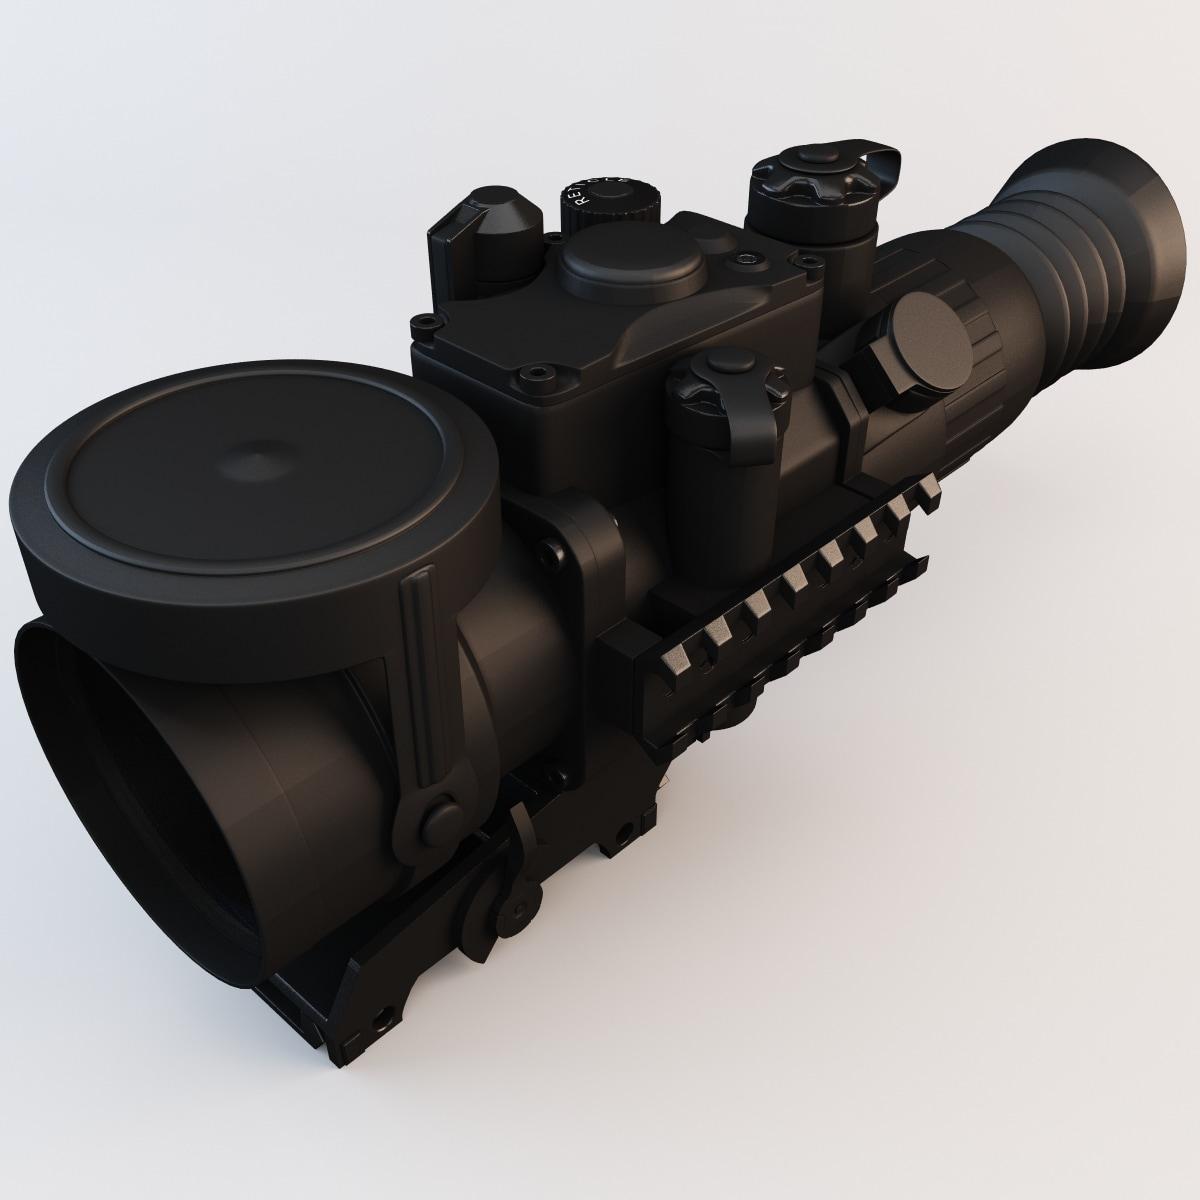 Night_Vision_Rifle_Scope_Yukon_Phantom_4x60_002.jpg